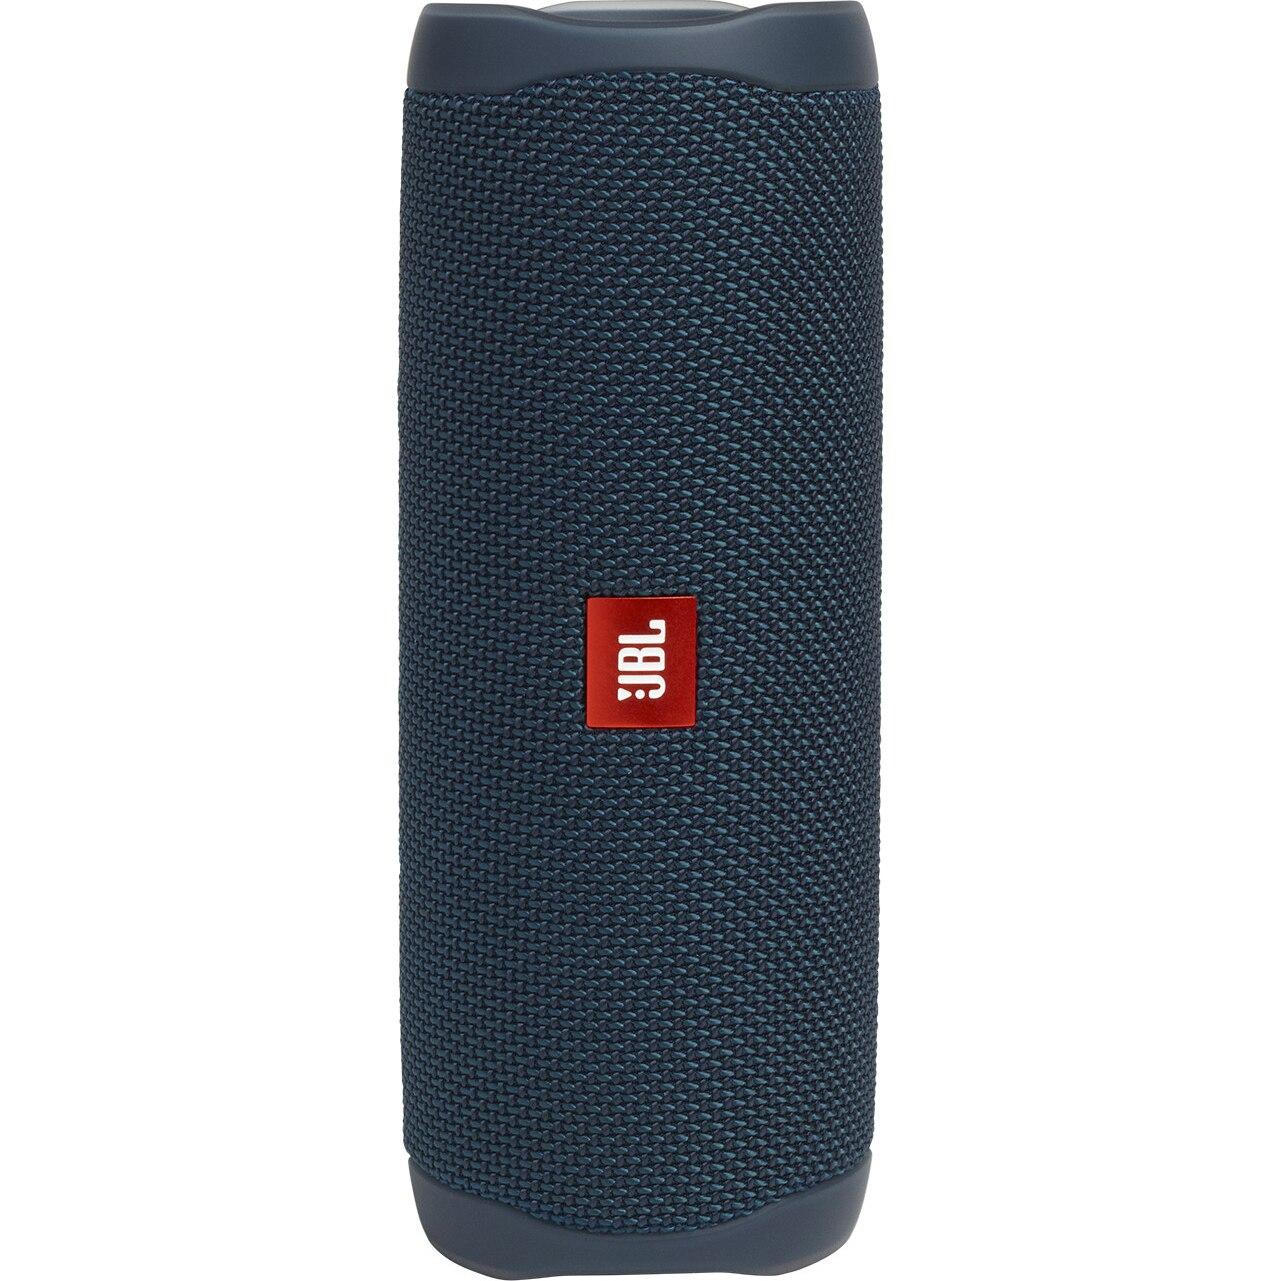 Fotografie Boxa portabila JBL FLIP5, Bluetooth, PartyBoost, USB C, Powerbank 4800mAh, Rezistenta la apa IPX7, Albastru